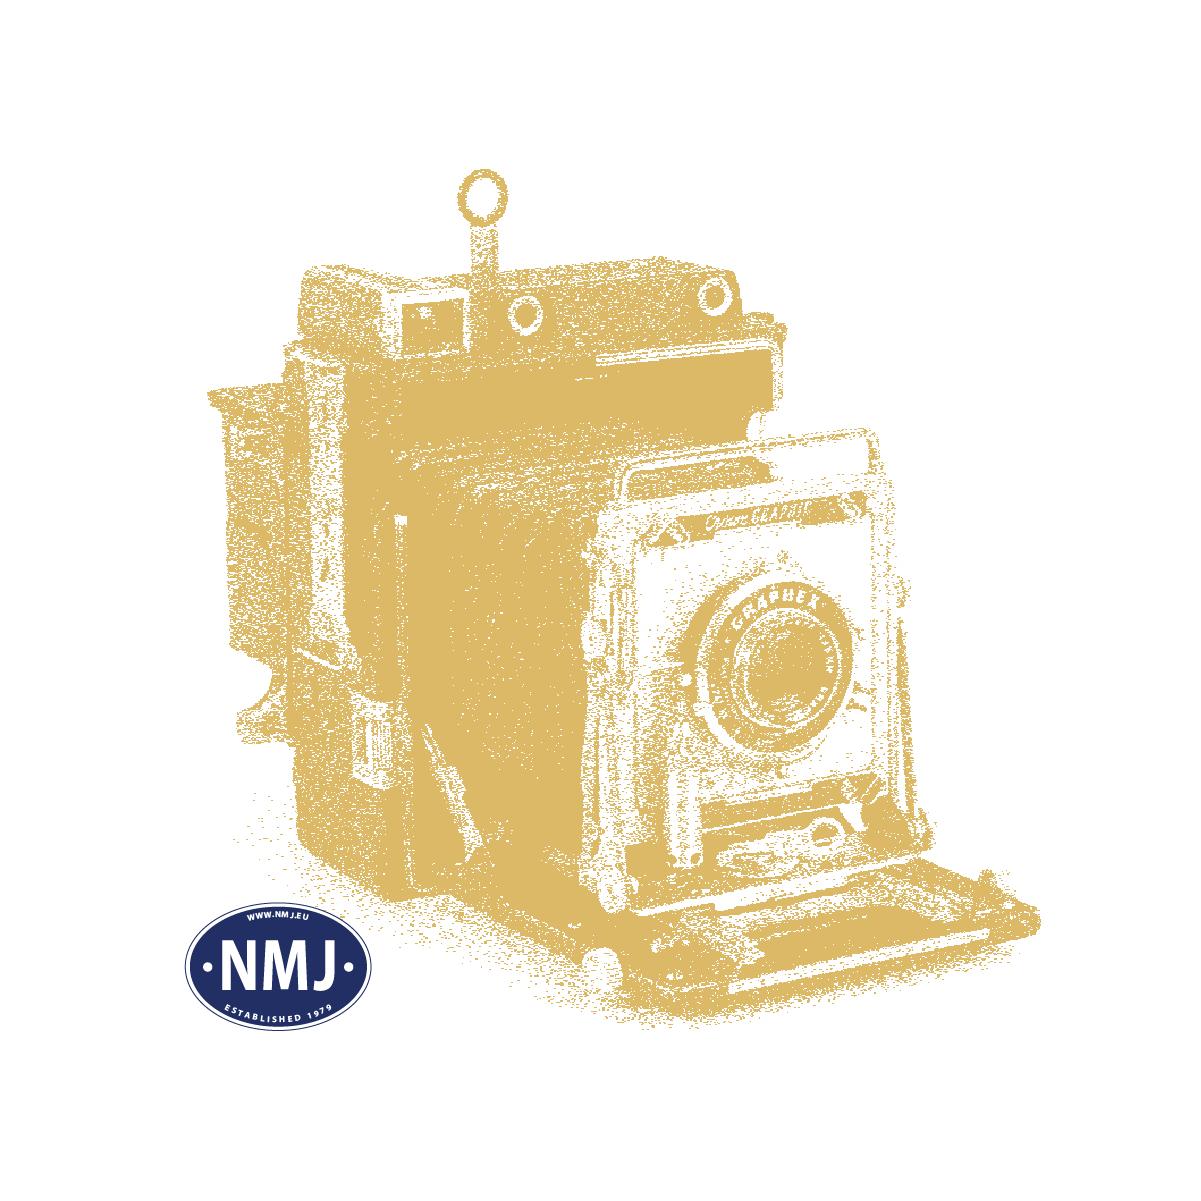 NOC58304 - Signalsokkel, 2 Stk.